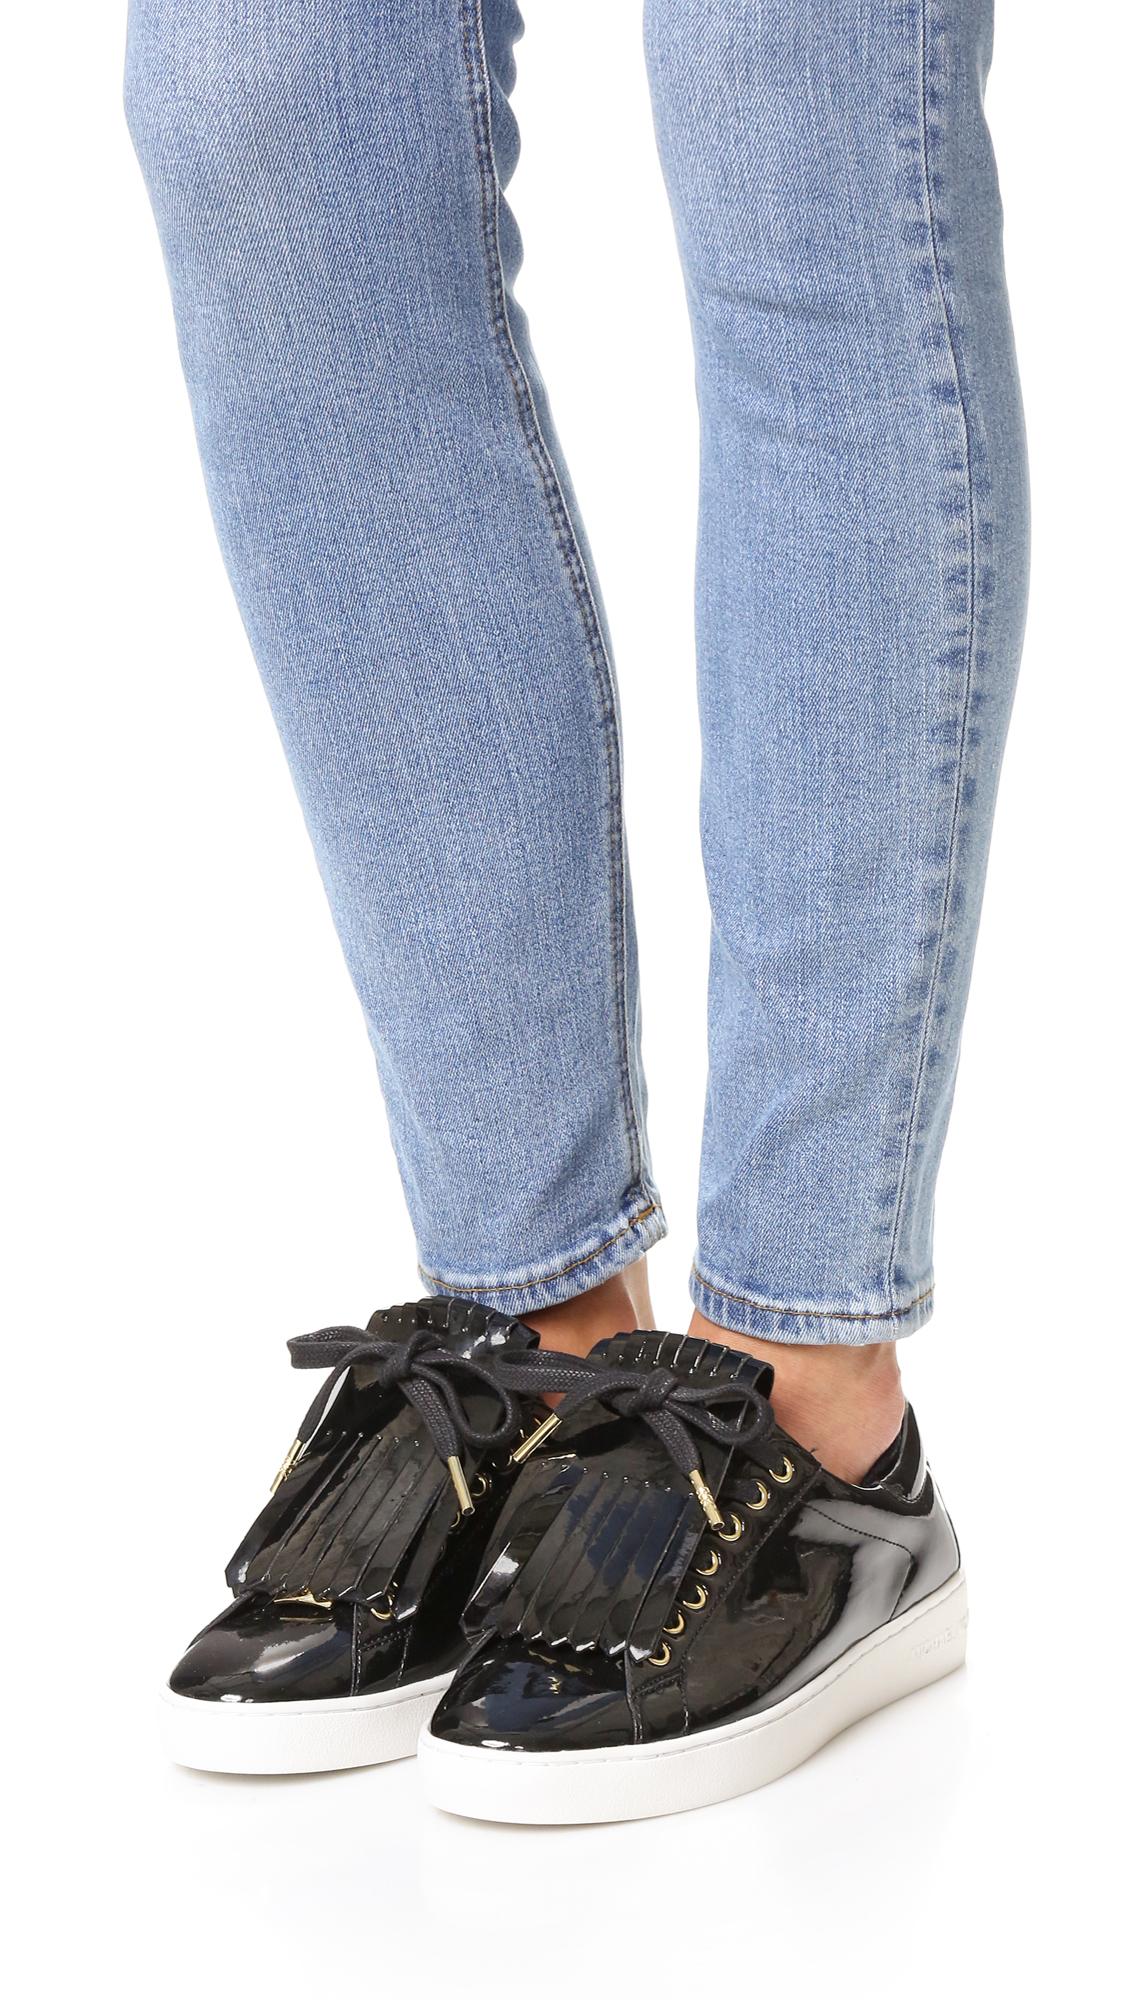 d7e546f42220 MICHAEL Michael Kors Keaton Kiltie Sneakers